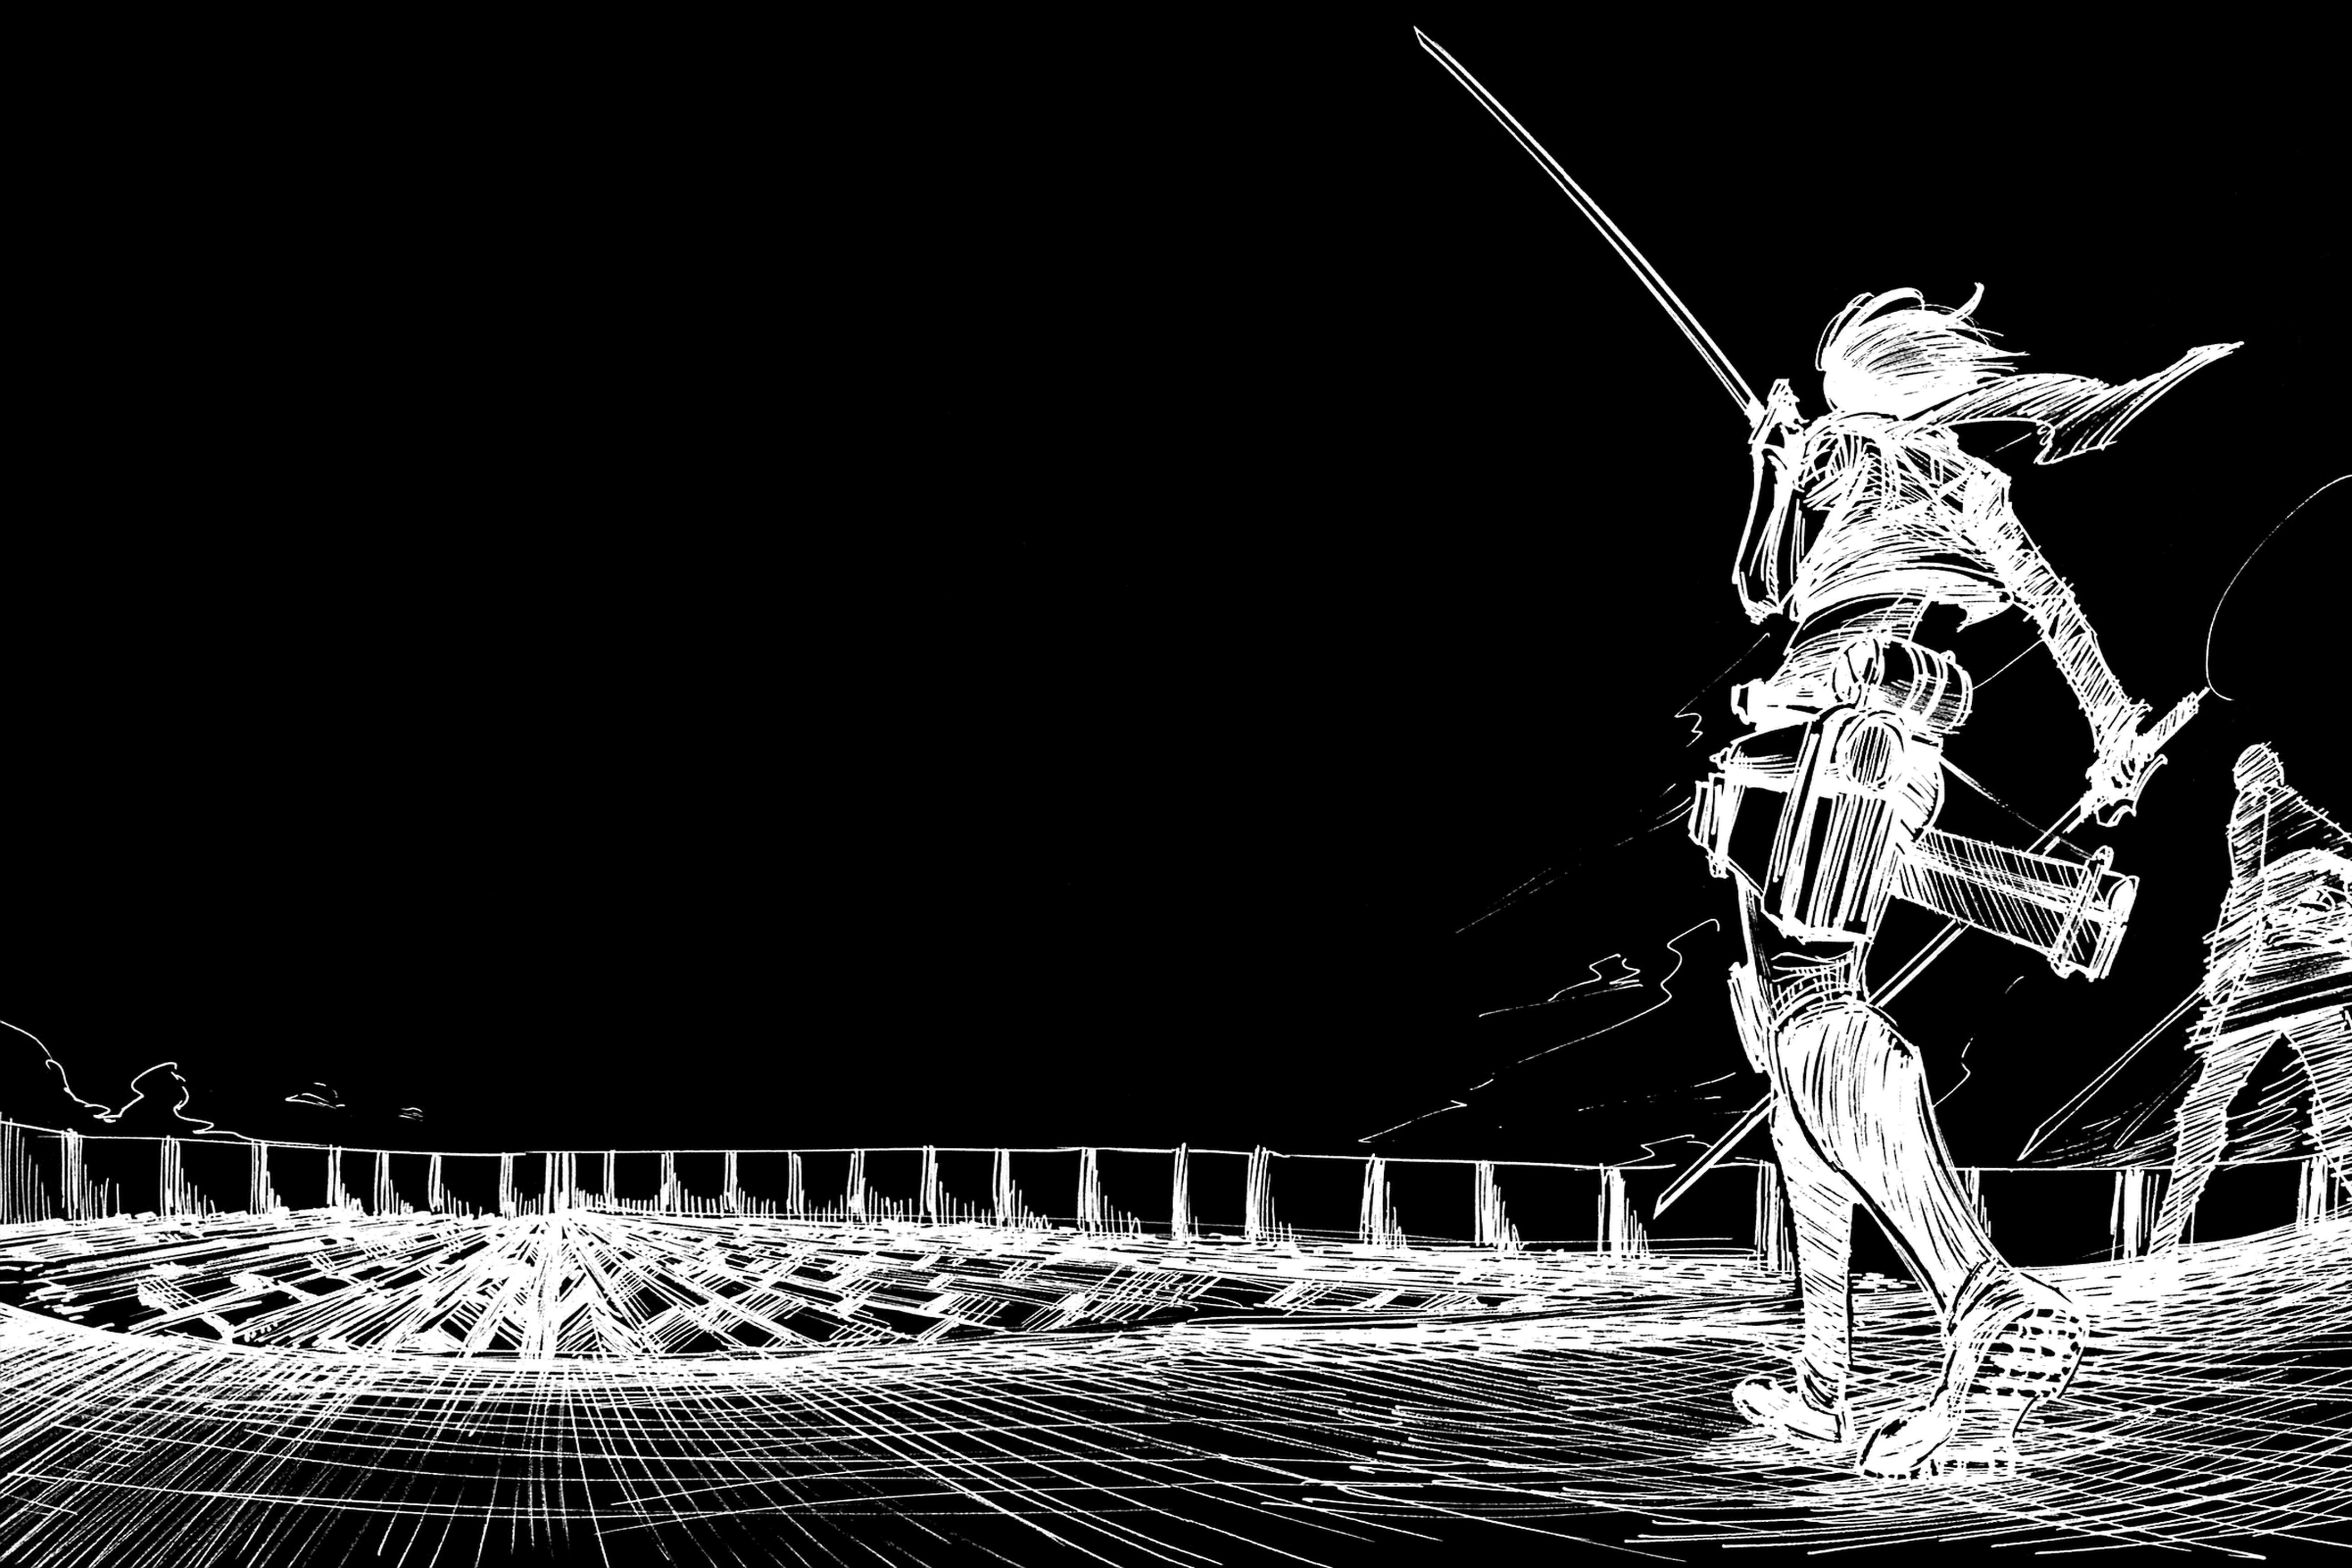 Anime Attack On Titan Wallpaper - Attack On Titan Wallpaper Manga - HD Wallpaper